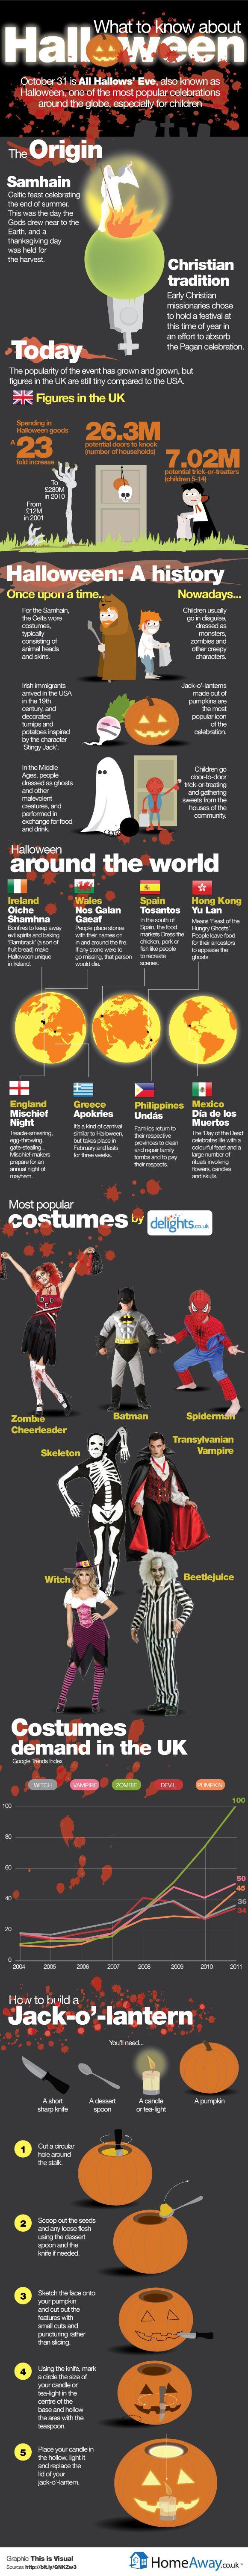 Four Halloween Infographics...Read On...If You Dare! - The Joyful Organizer